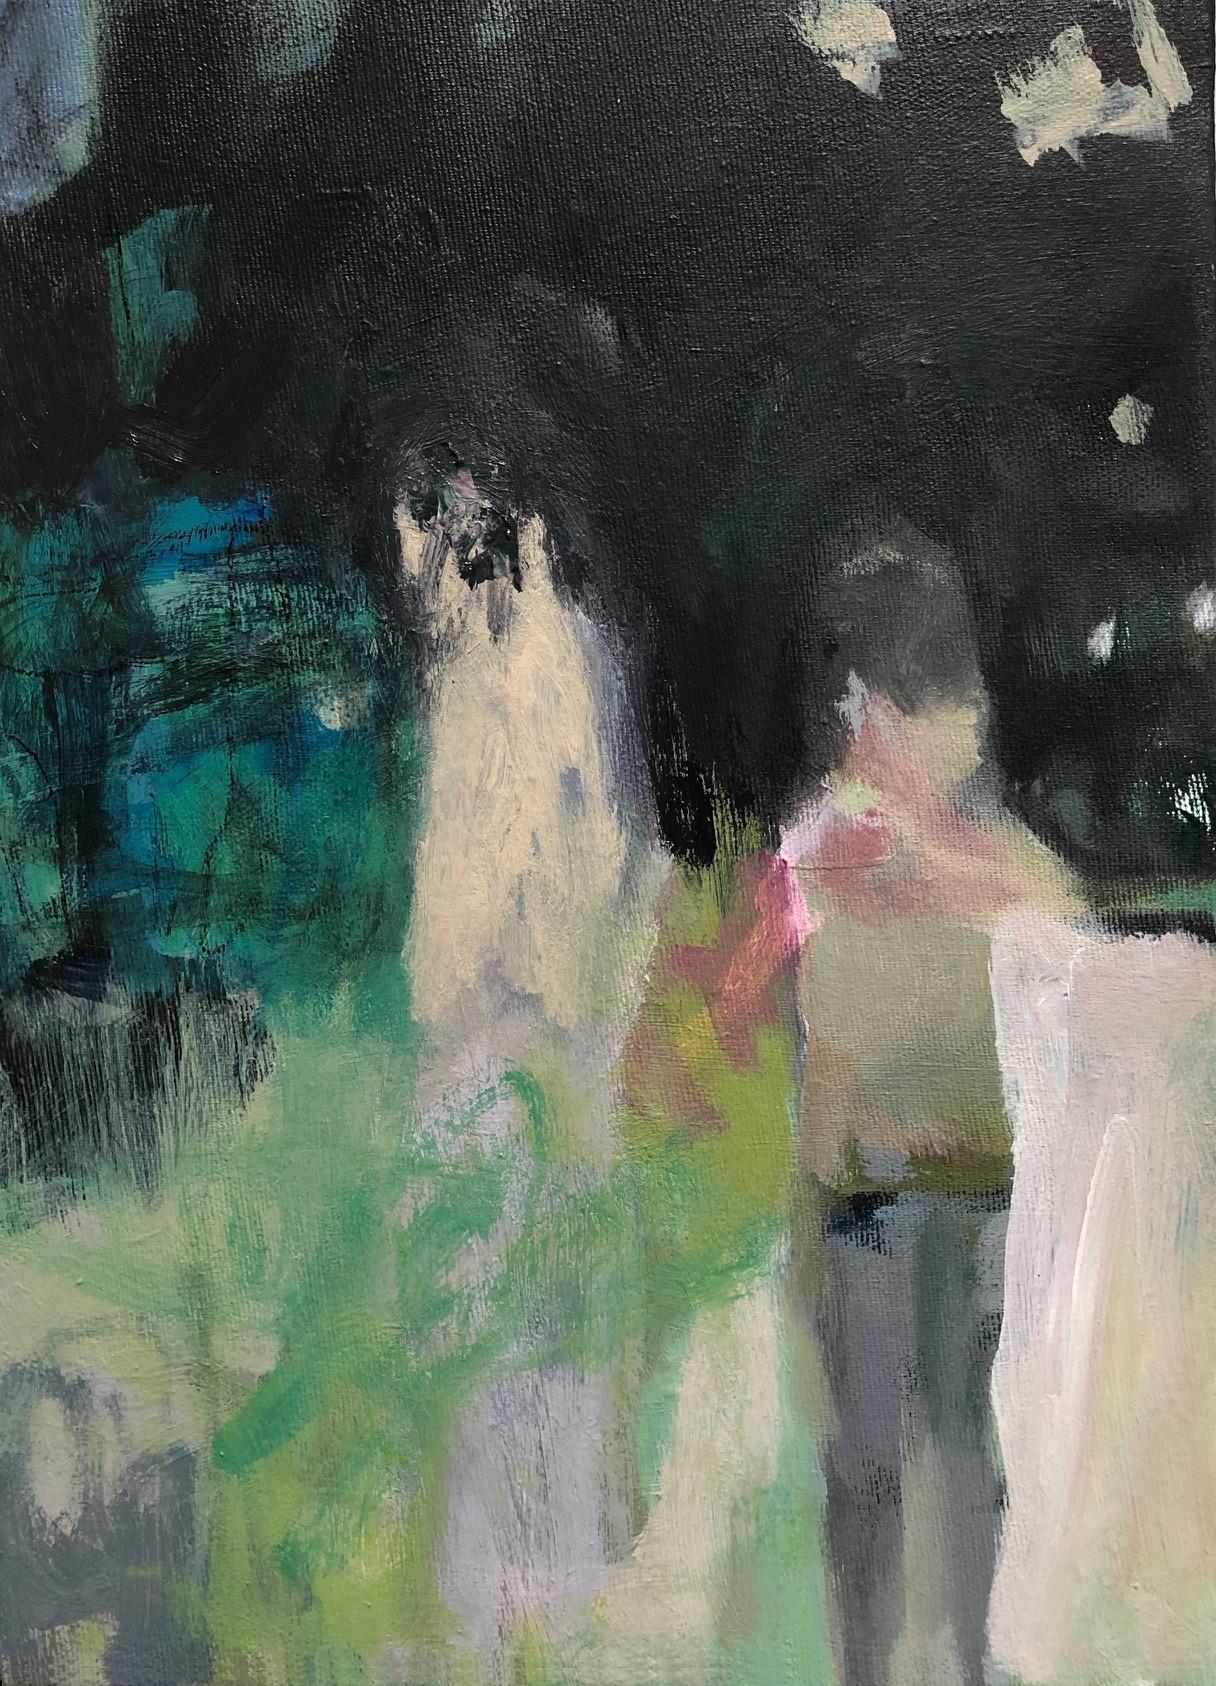 catherine-seher-artiste-peintre-expositi